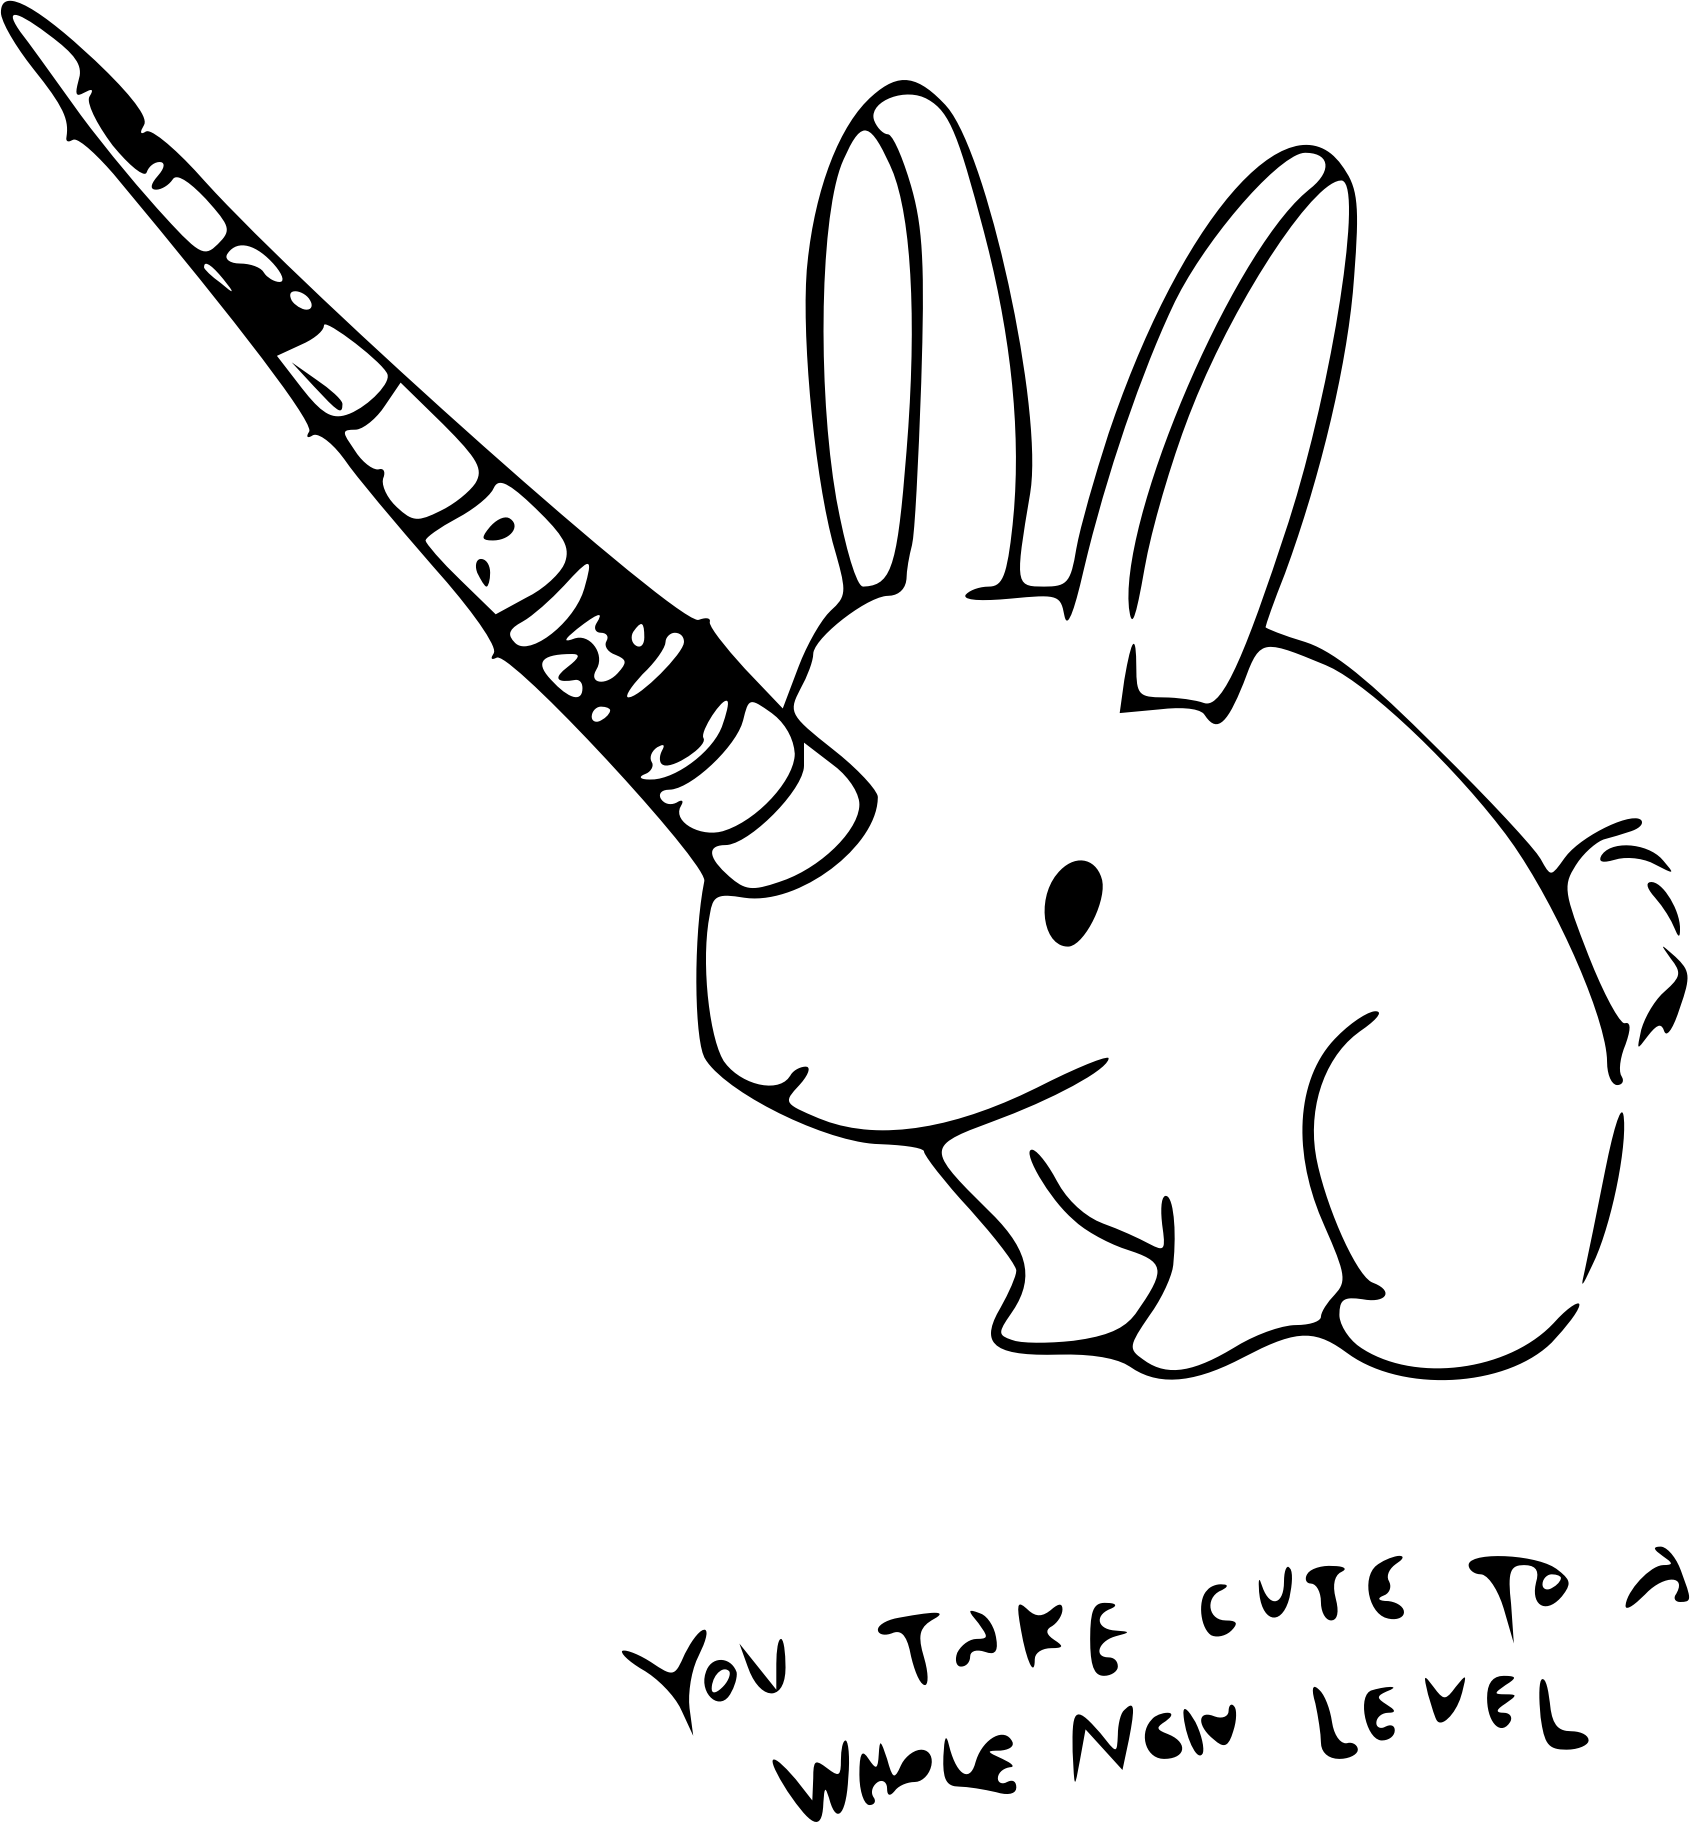 clipart unicorn outline